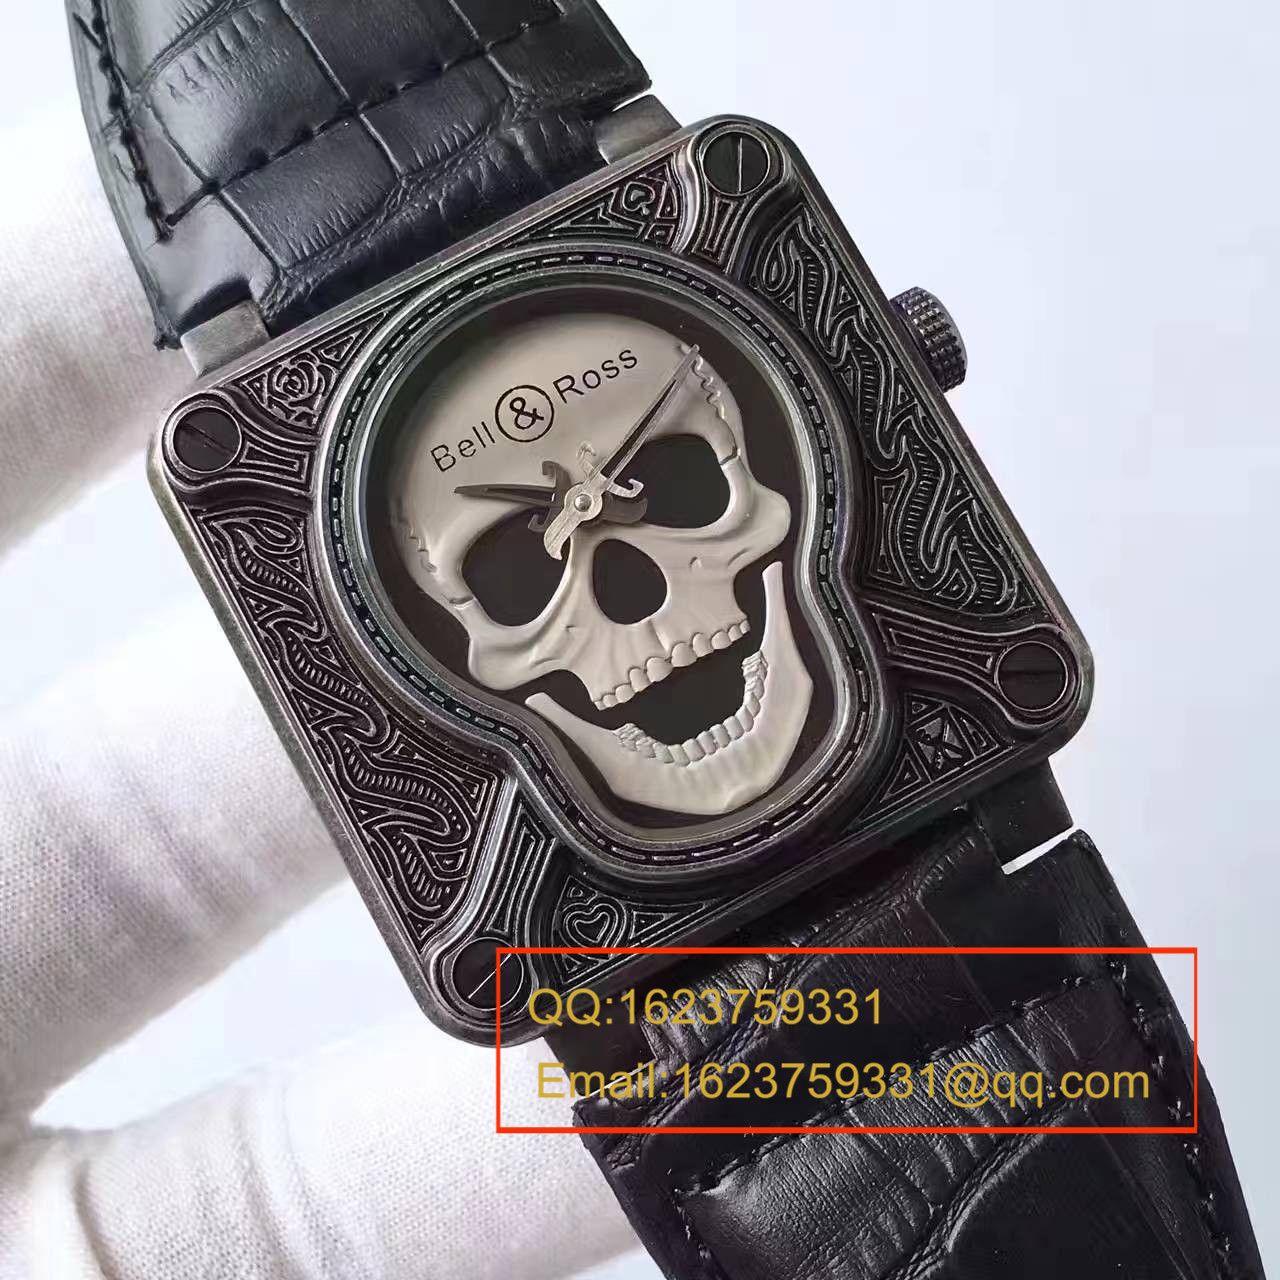 【UK厂一比一超A高仿手表】柏莱士AVIATION系列BR 01 BURNING SKULL腕表 / BL014